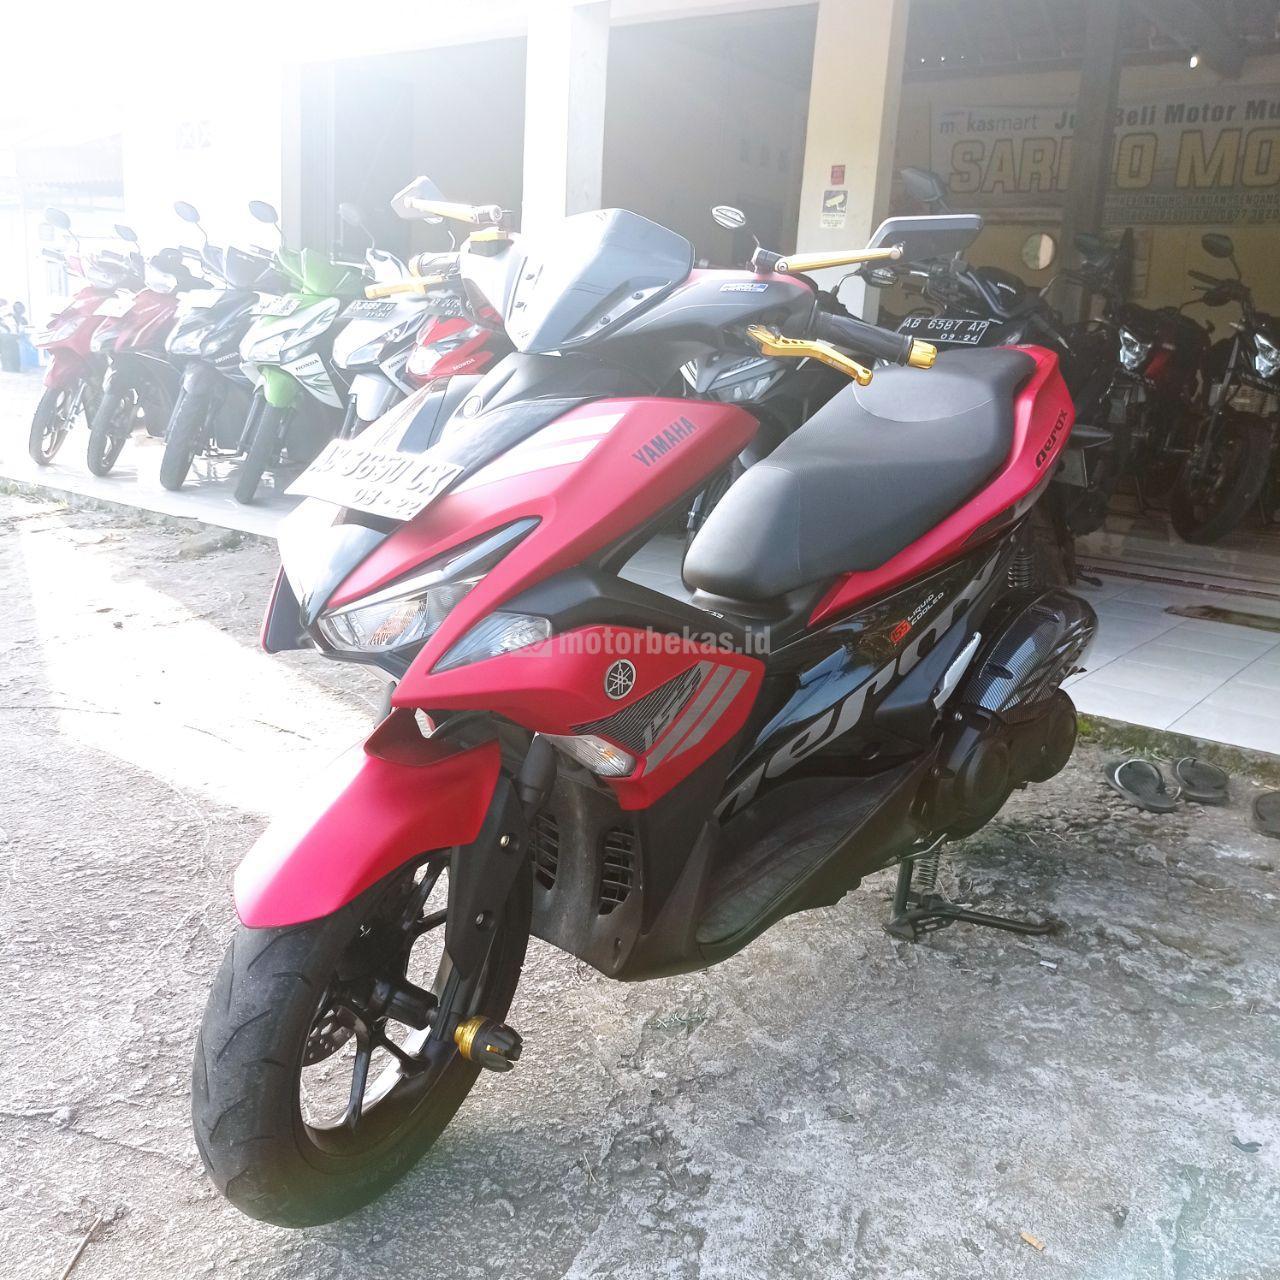 YAMAHA AEROX 155 VVA 692 motorbekas.id